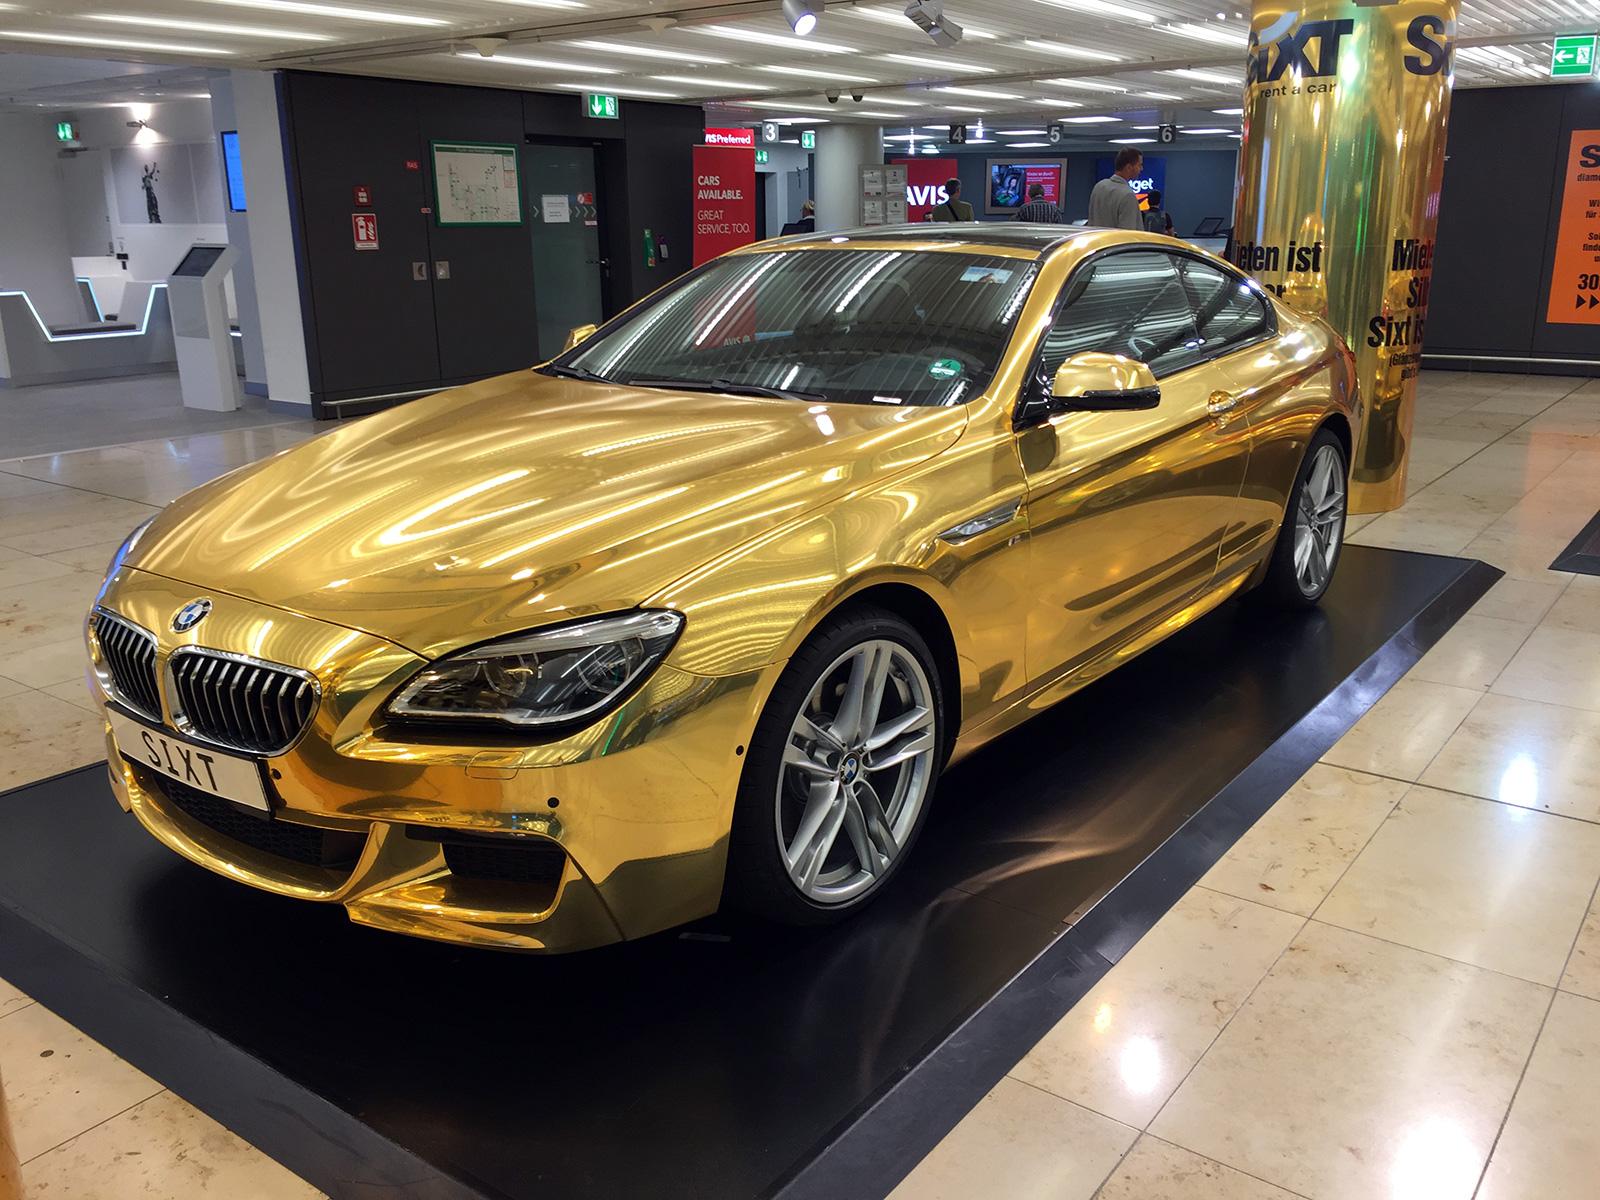 BMW in Frankfurt, Germany by Jets Like Taxis